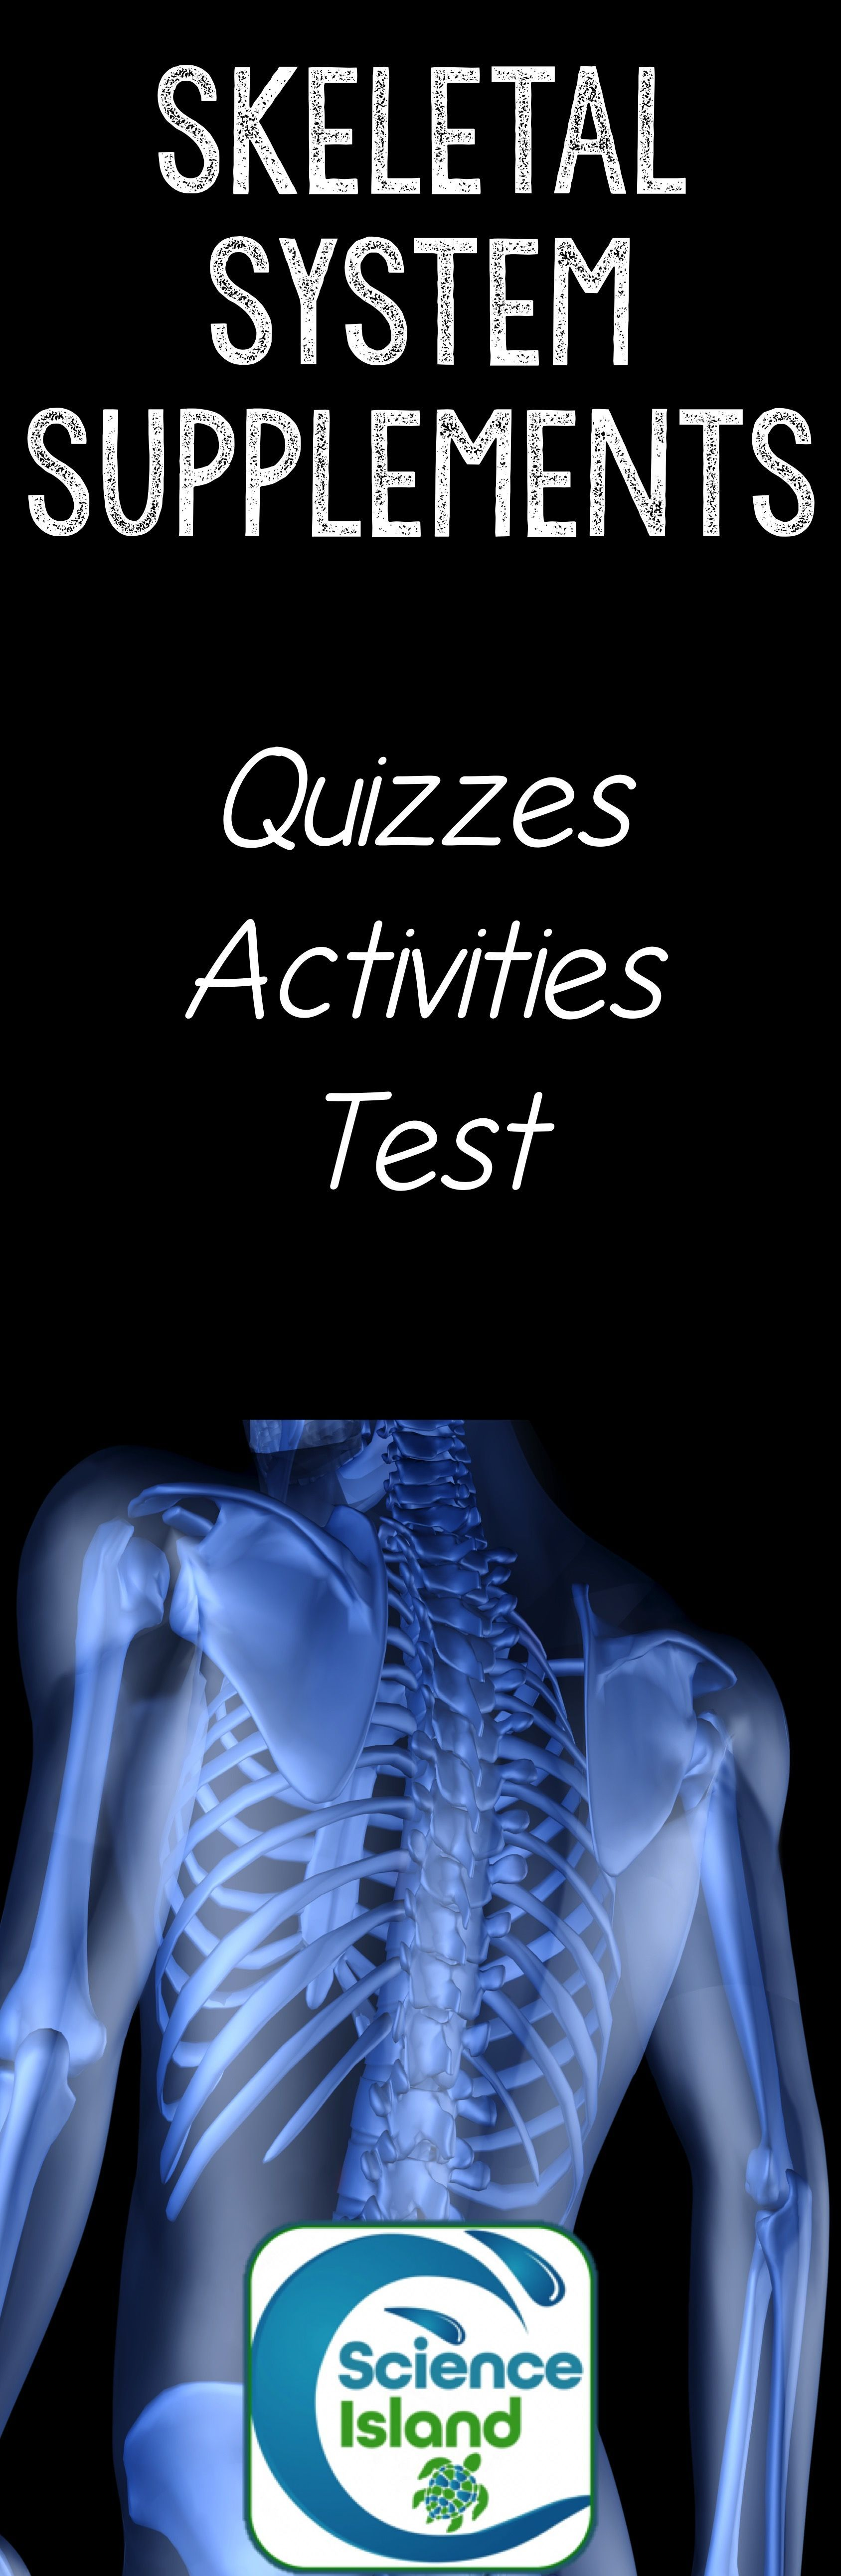 Skeletal System Supplements for Instruction and Assessment ...